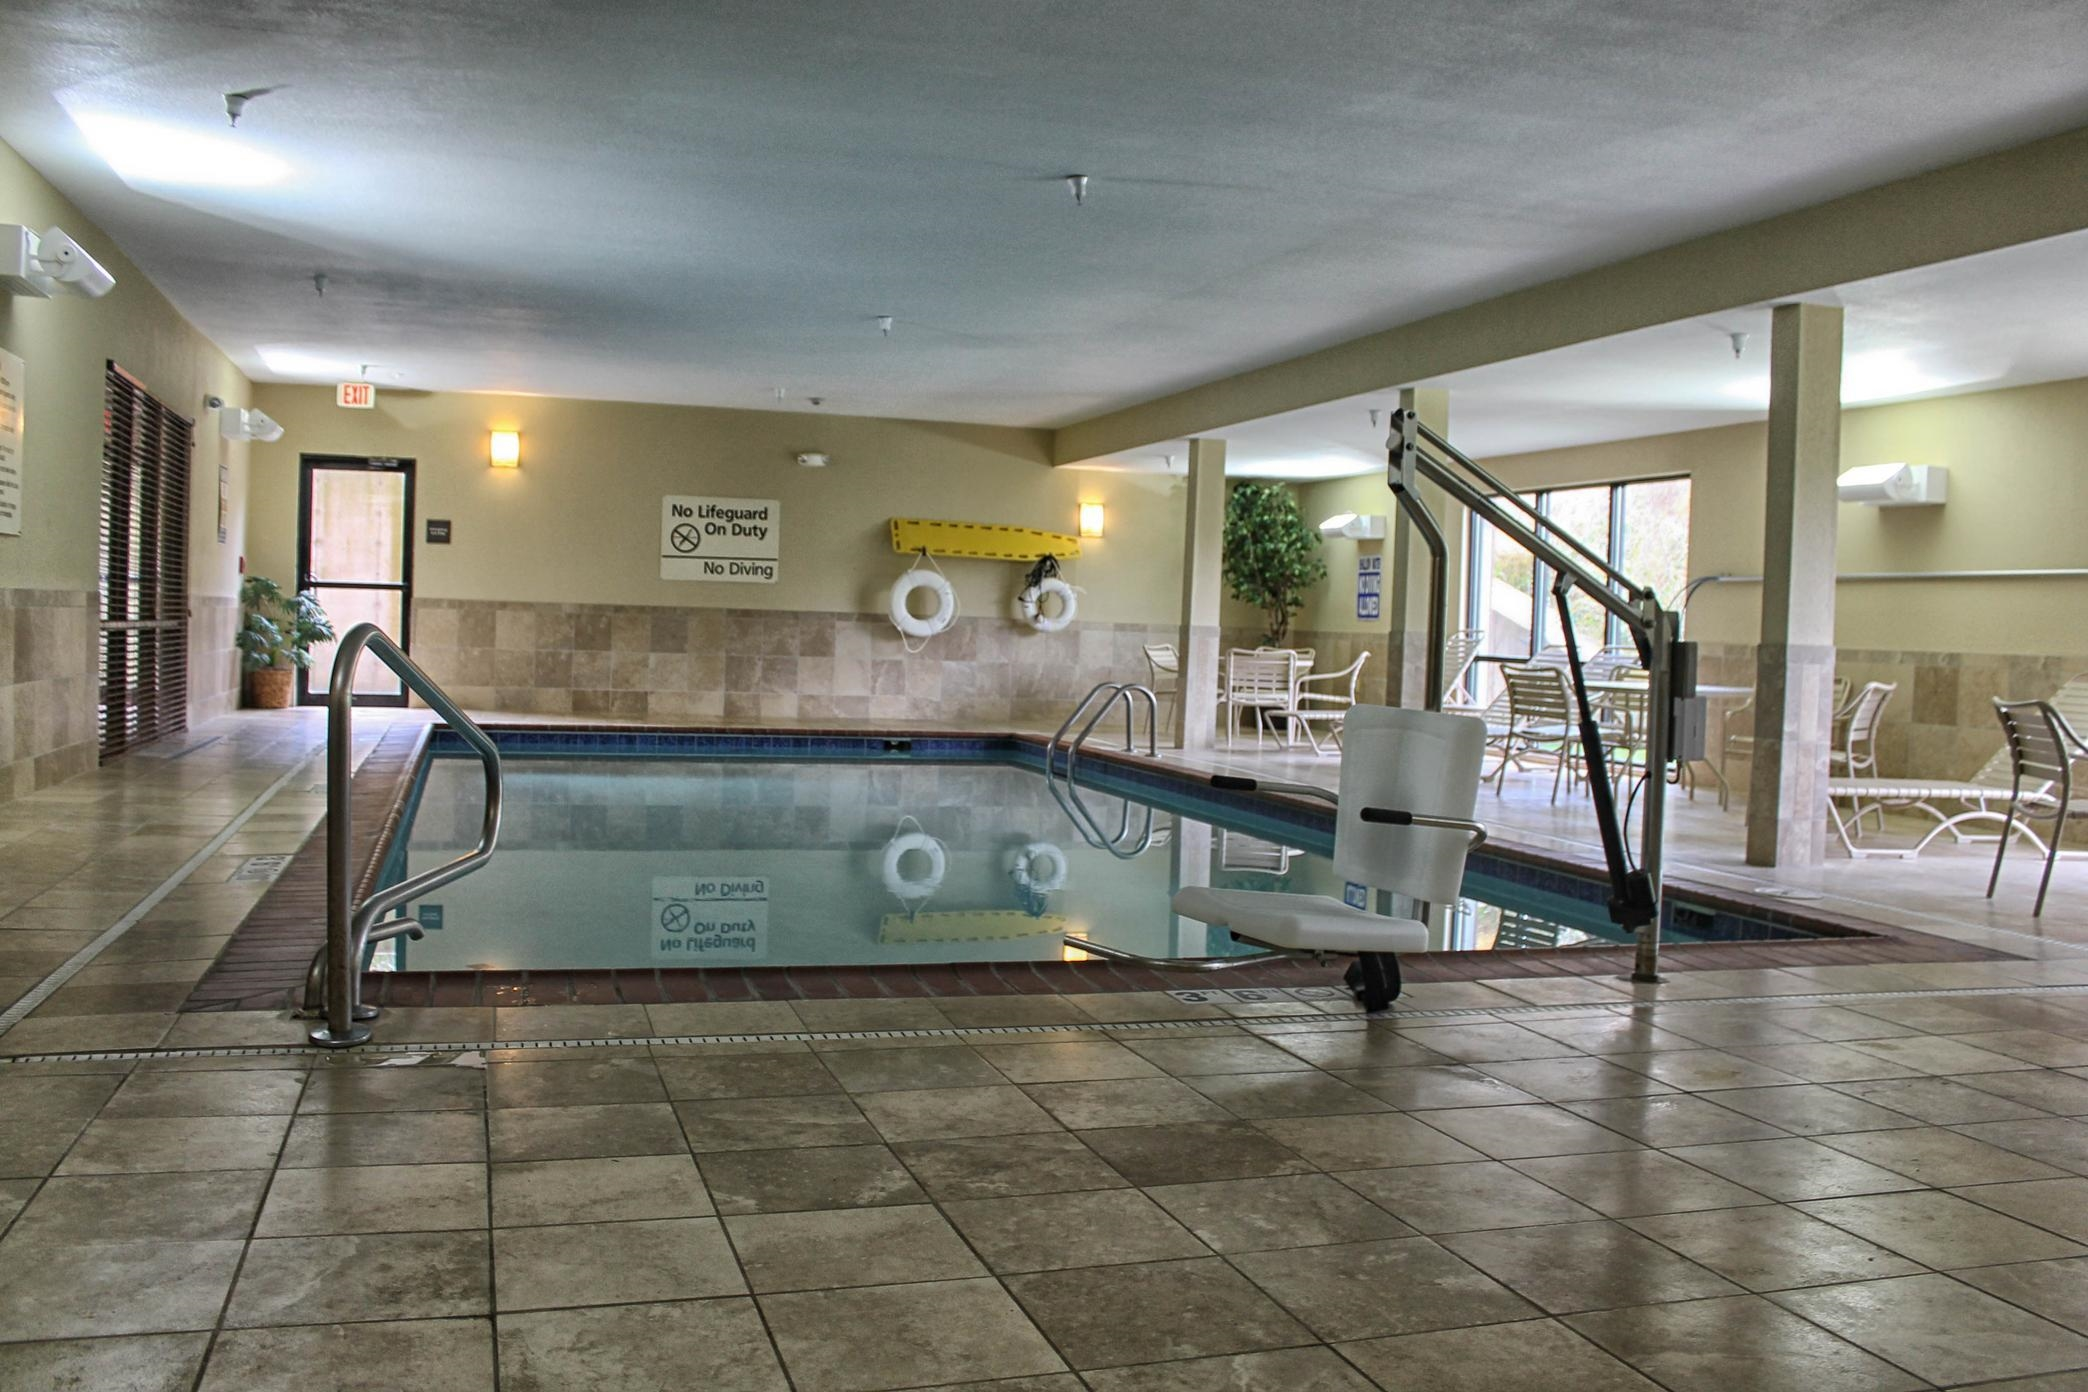 Hampton Inn & Suites Mansfield-South @ I-71 image 3